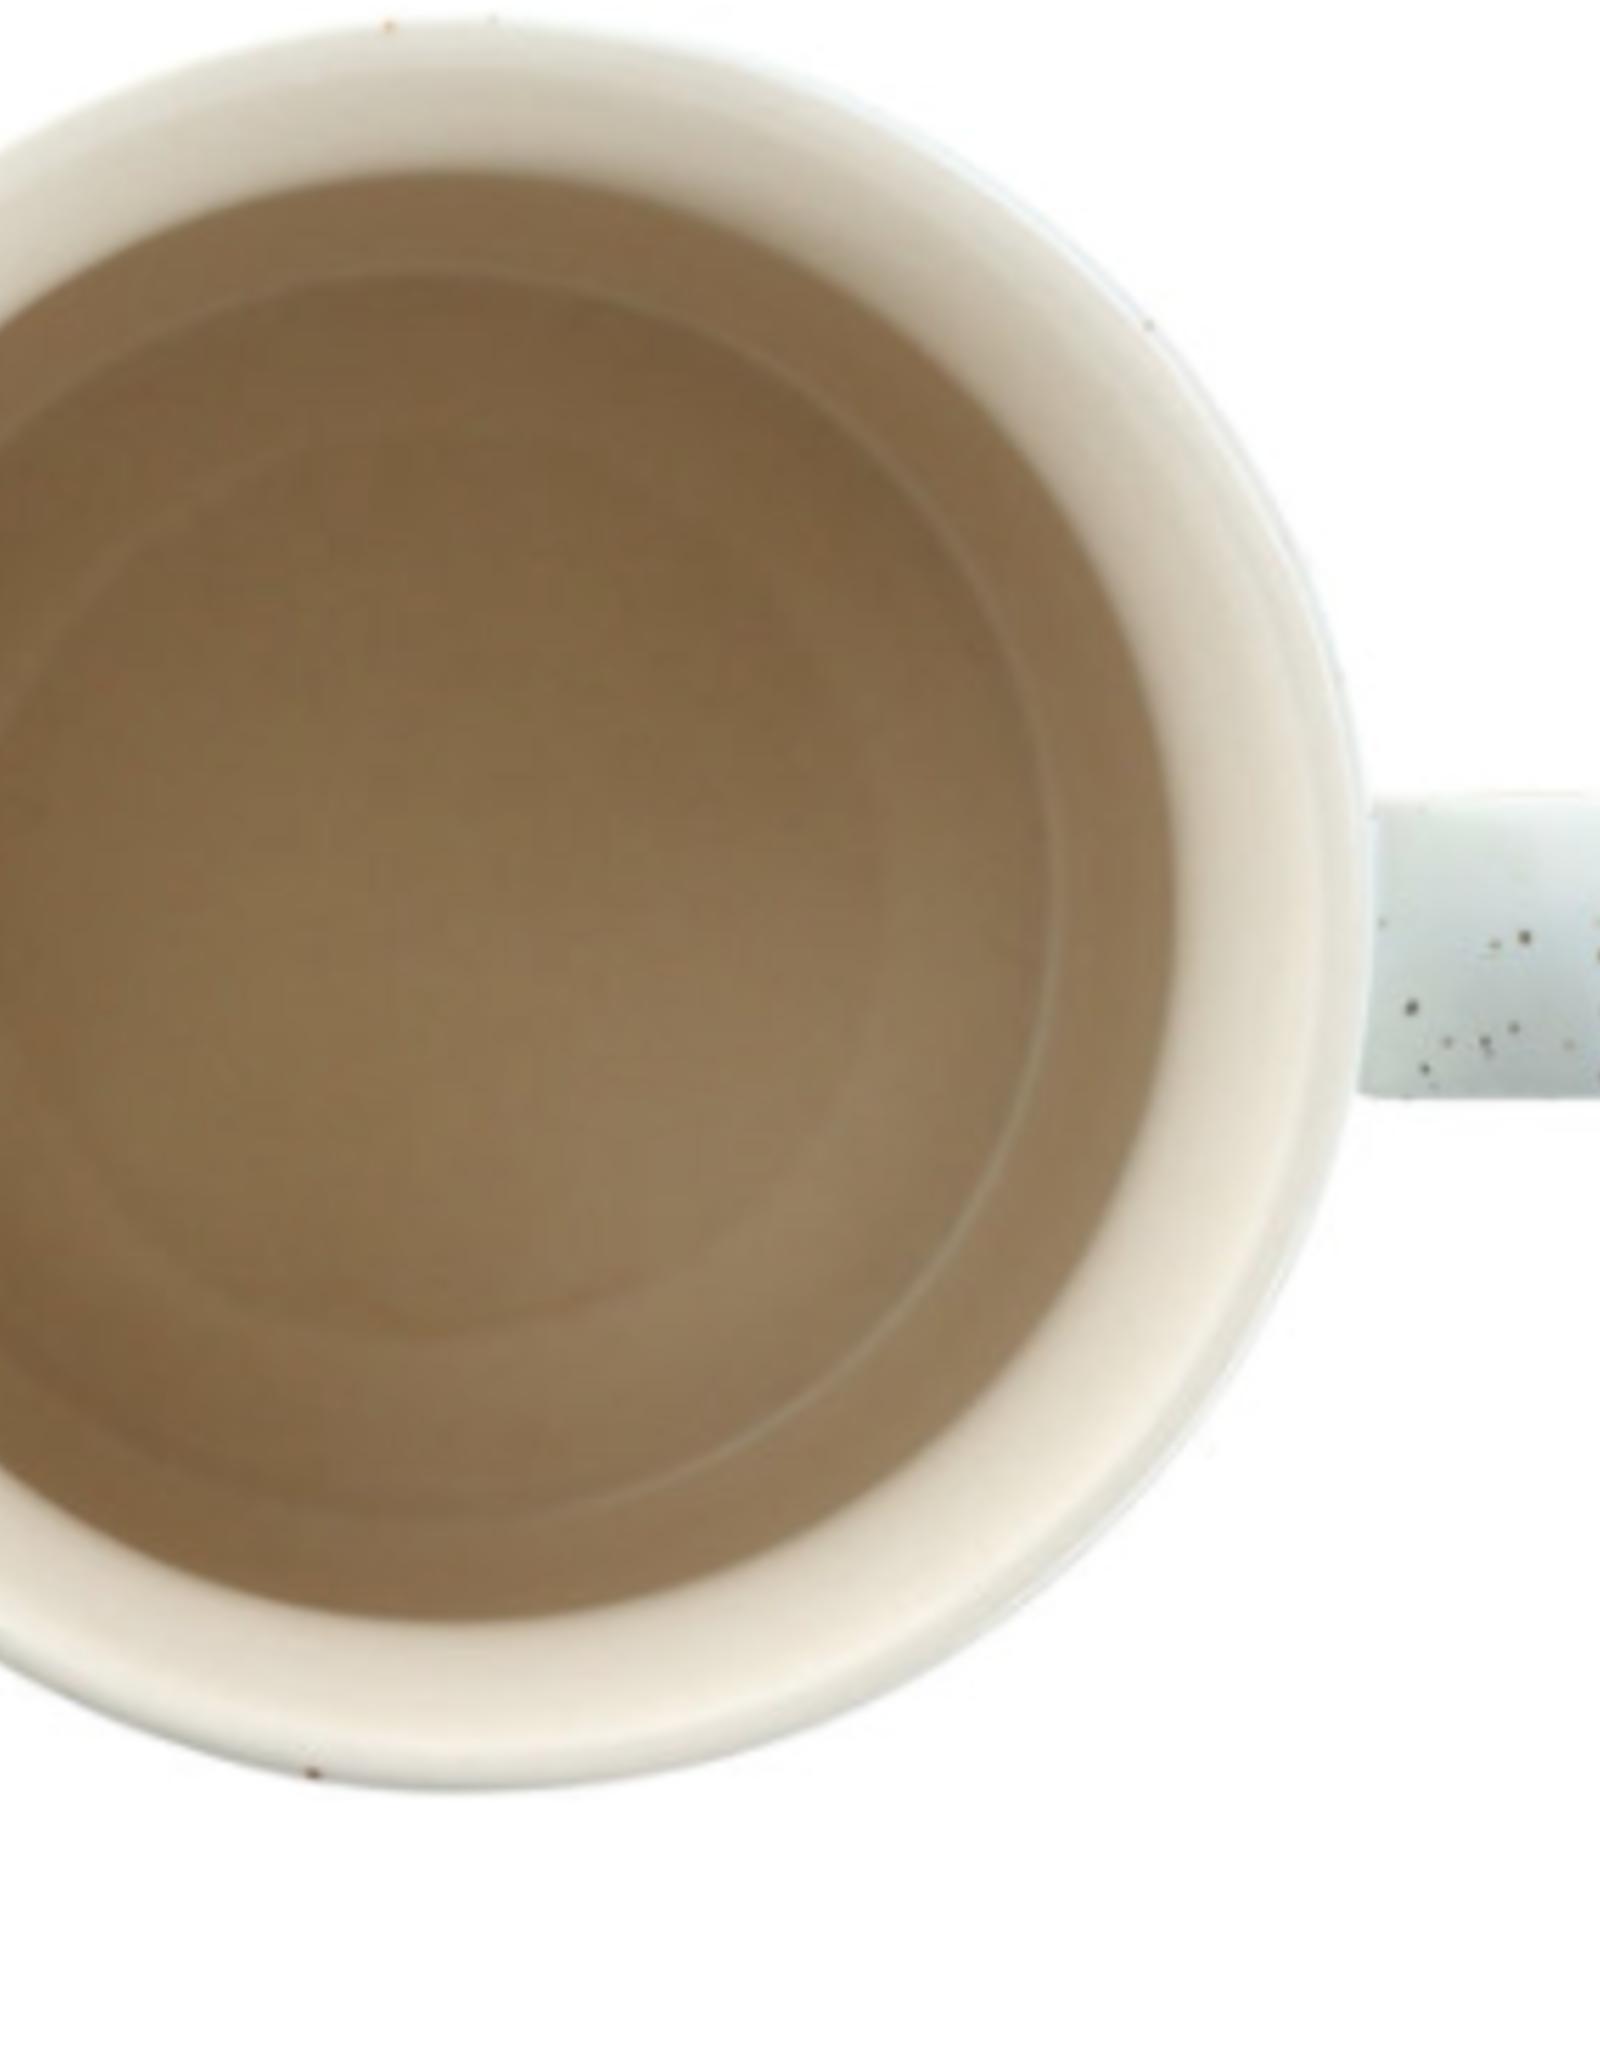 PAVILION Retired One Sip At a Time Mug